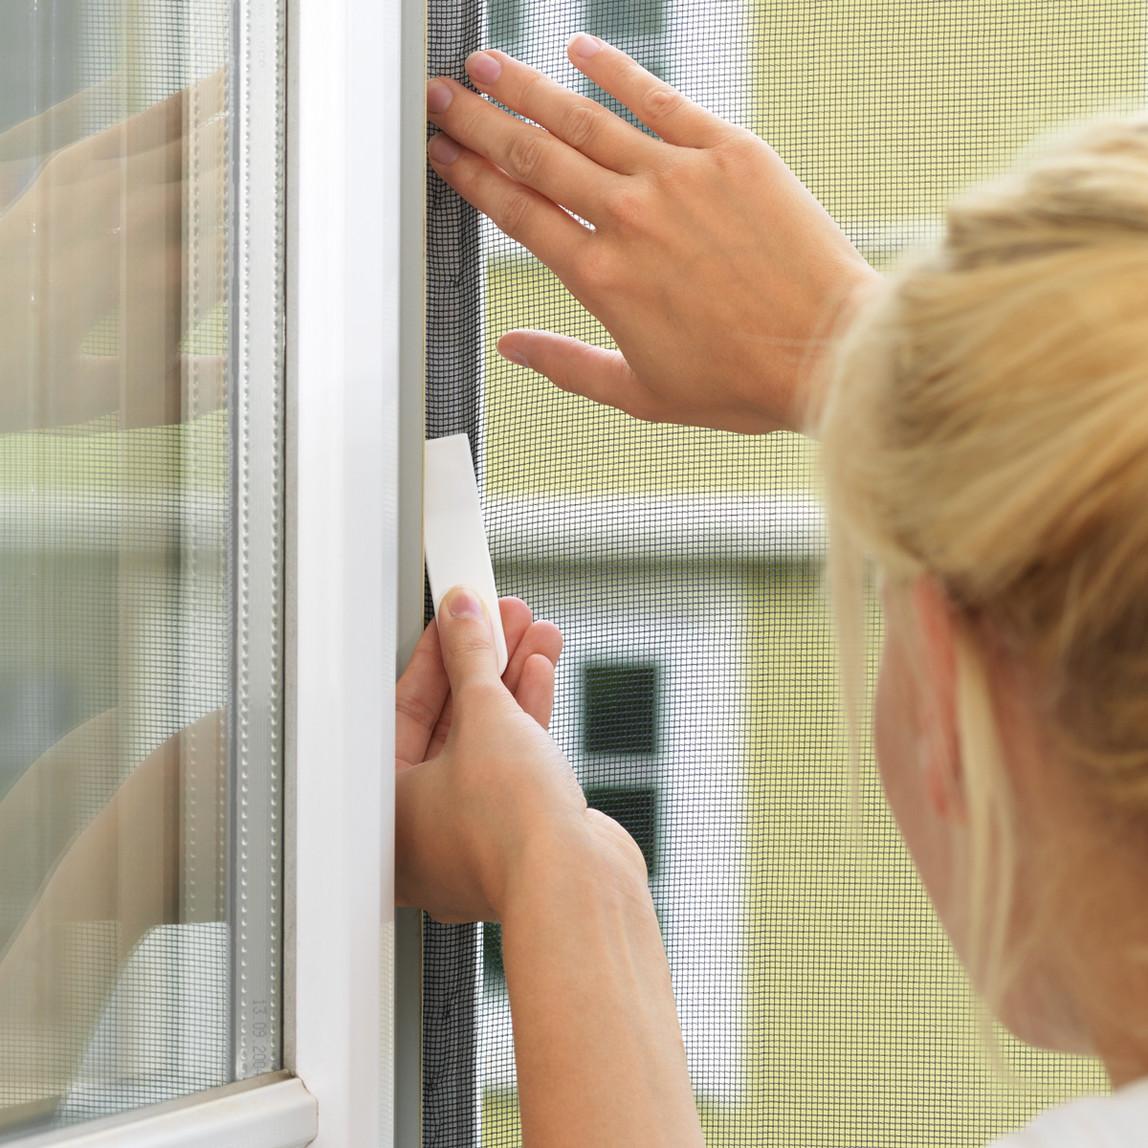 Tesa Pencere Sineklik Standart Cırt Bantlı Siyah 1,3Mx1,5M